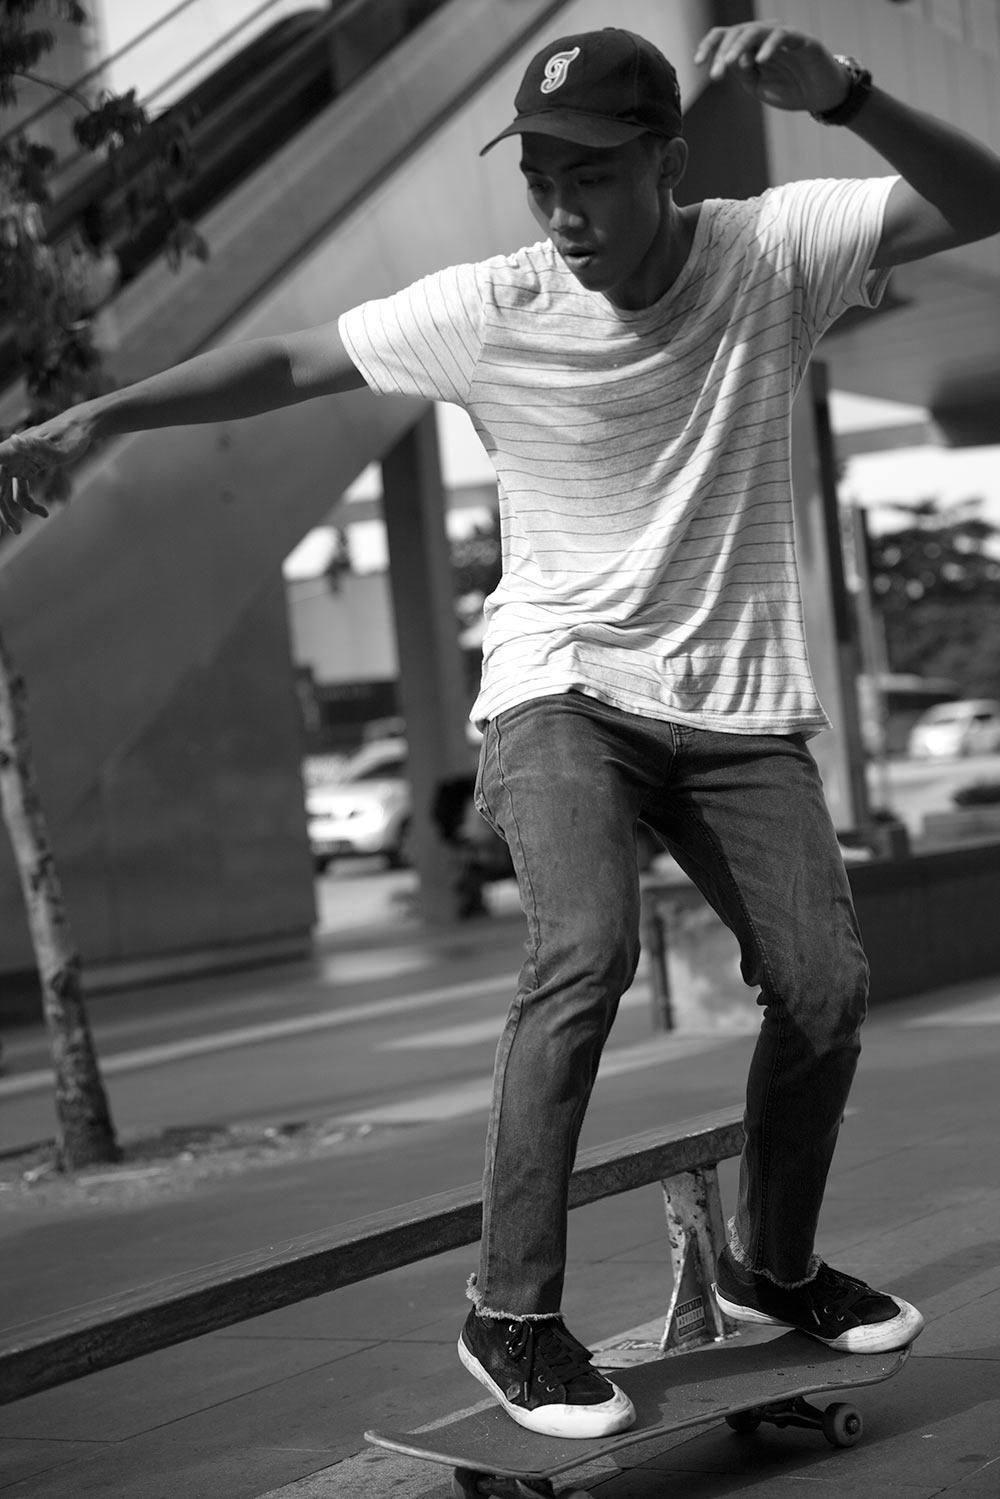 Eric skateboarding KLCC